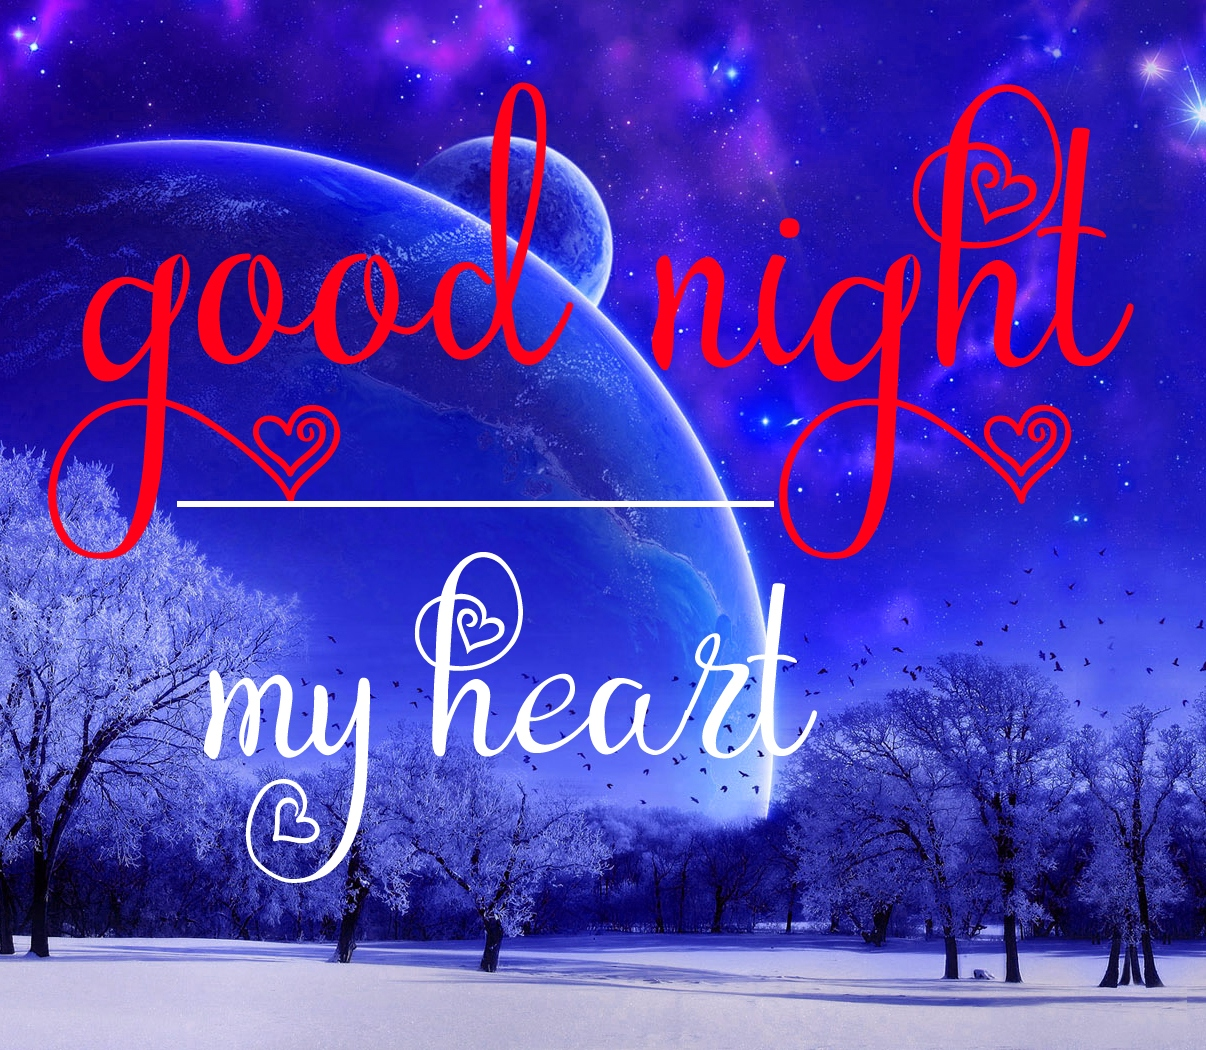 Free good night Images 32